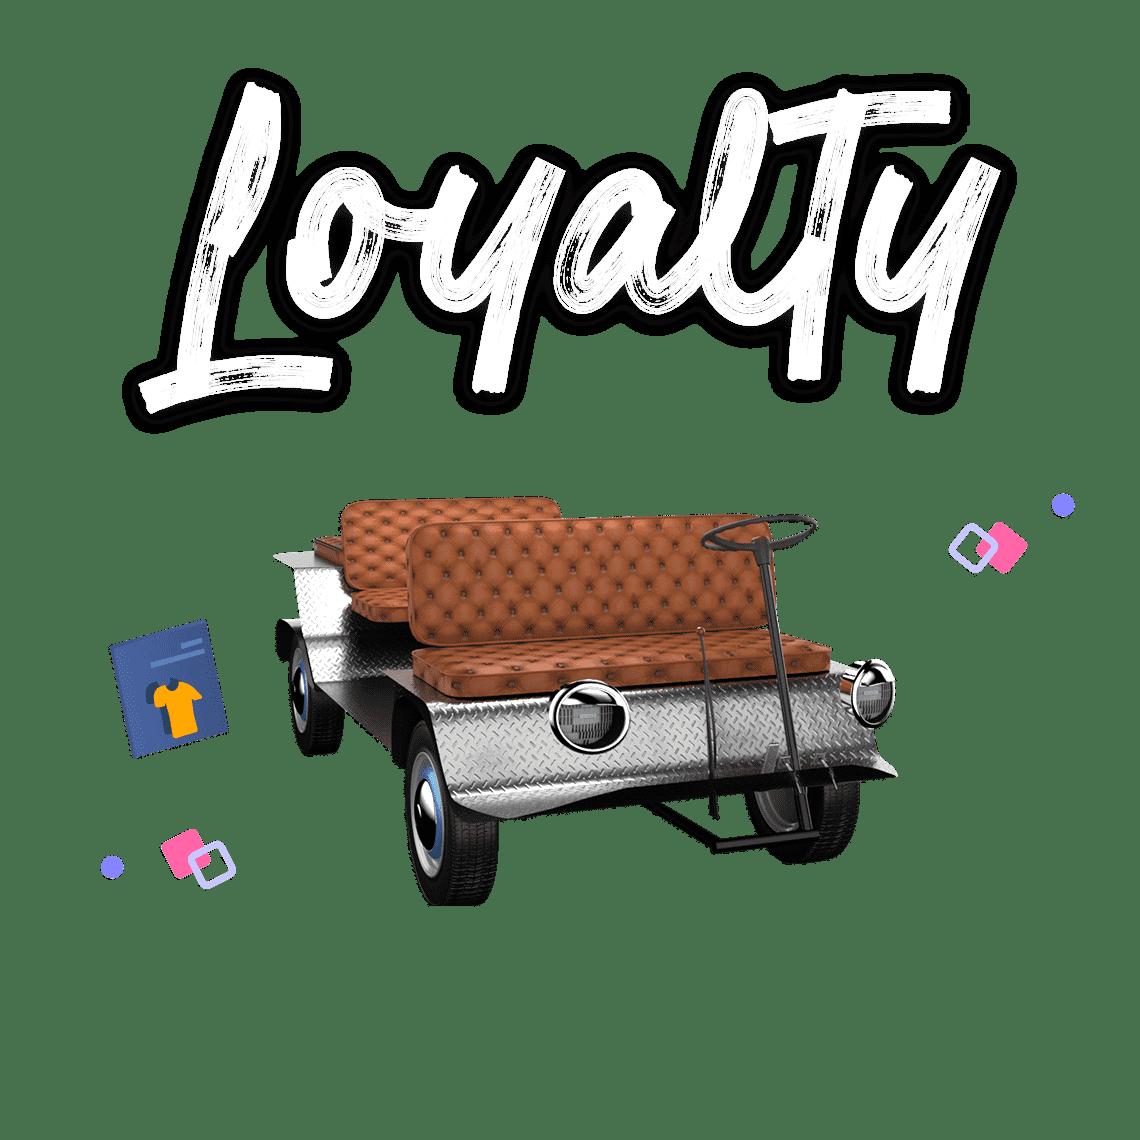 IDEEO 4.0 Loyalti